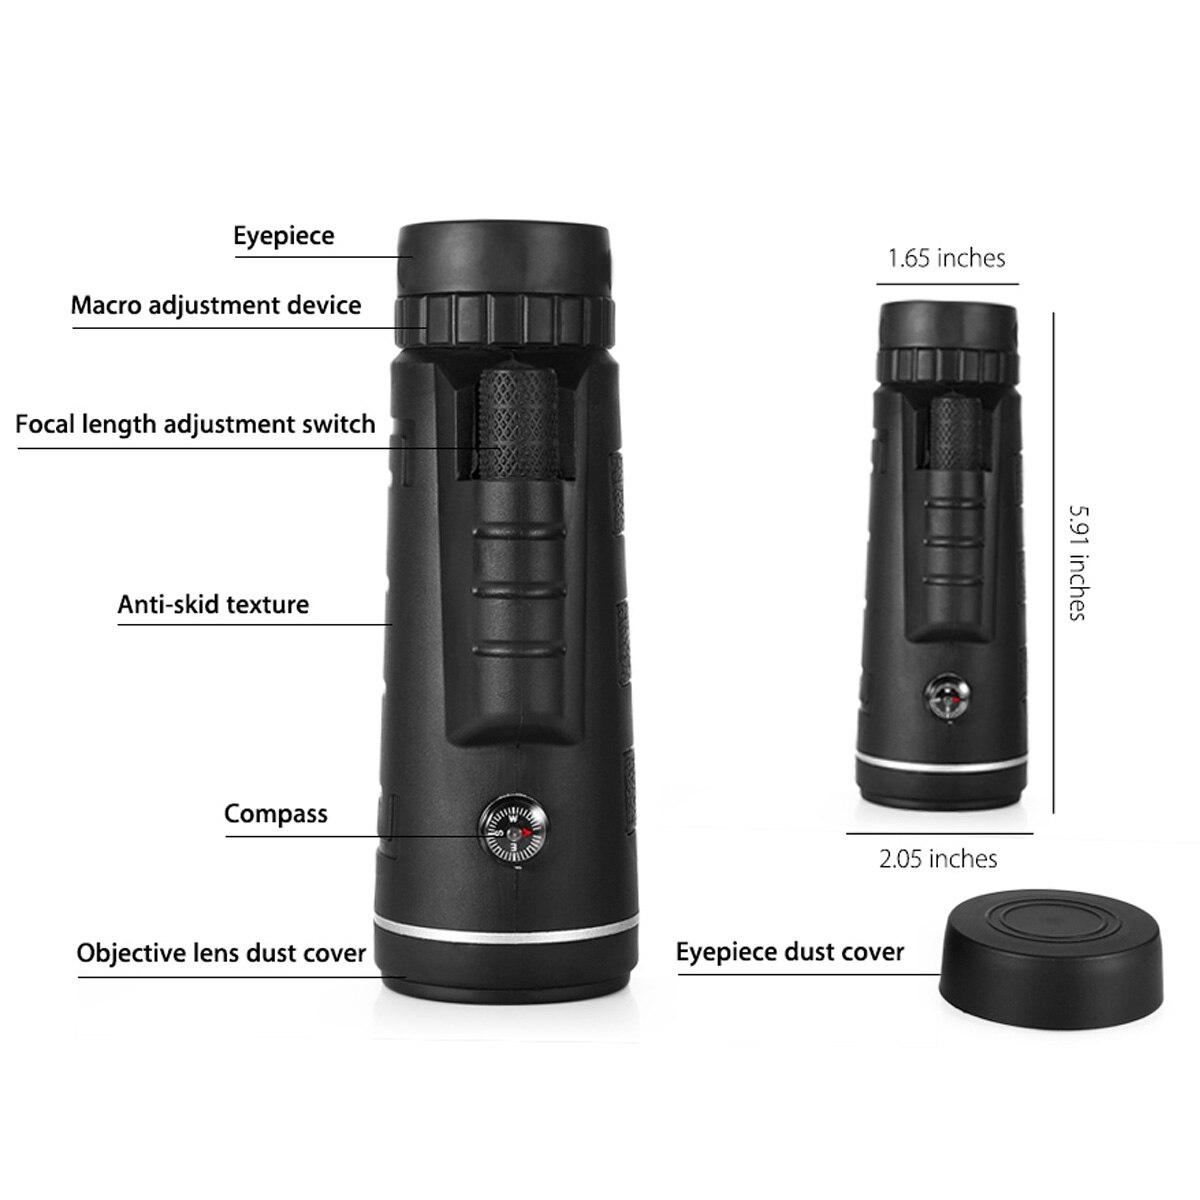 telescope telephoto zoom photo camera lens for smartphones detailed description